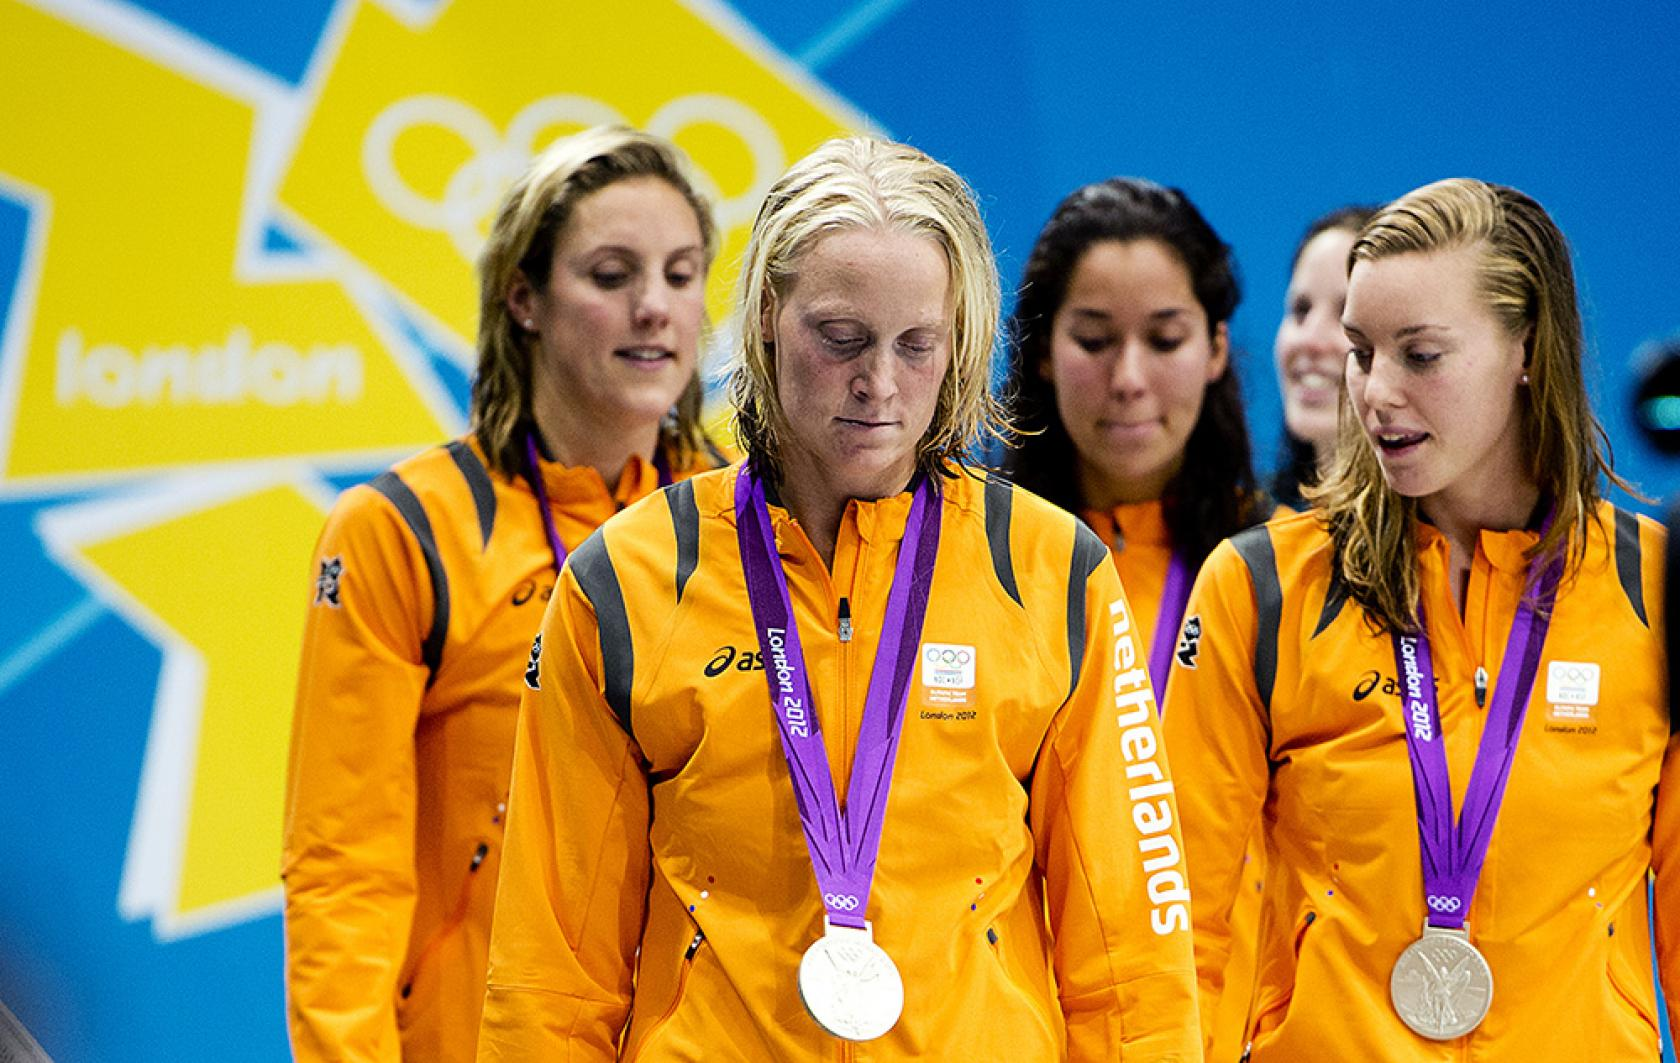 Zilver estafettezwemsters Olympische Spelen in Londen